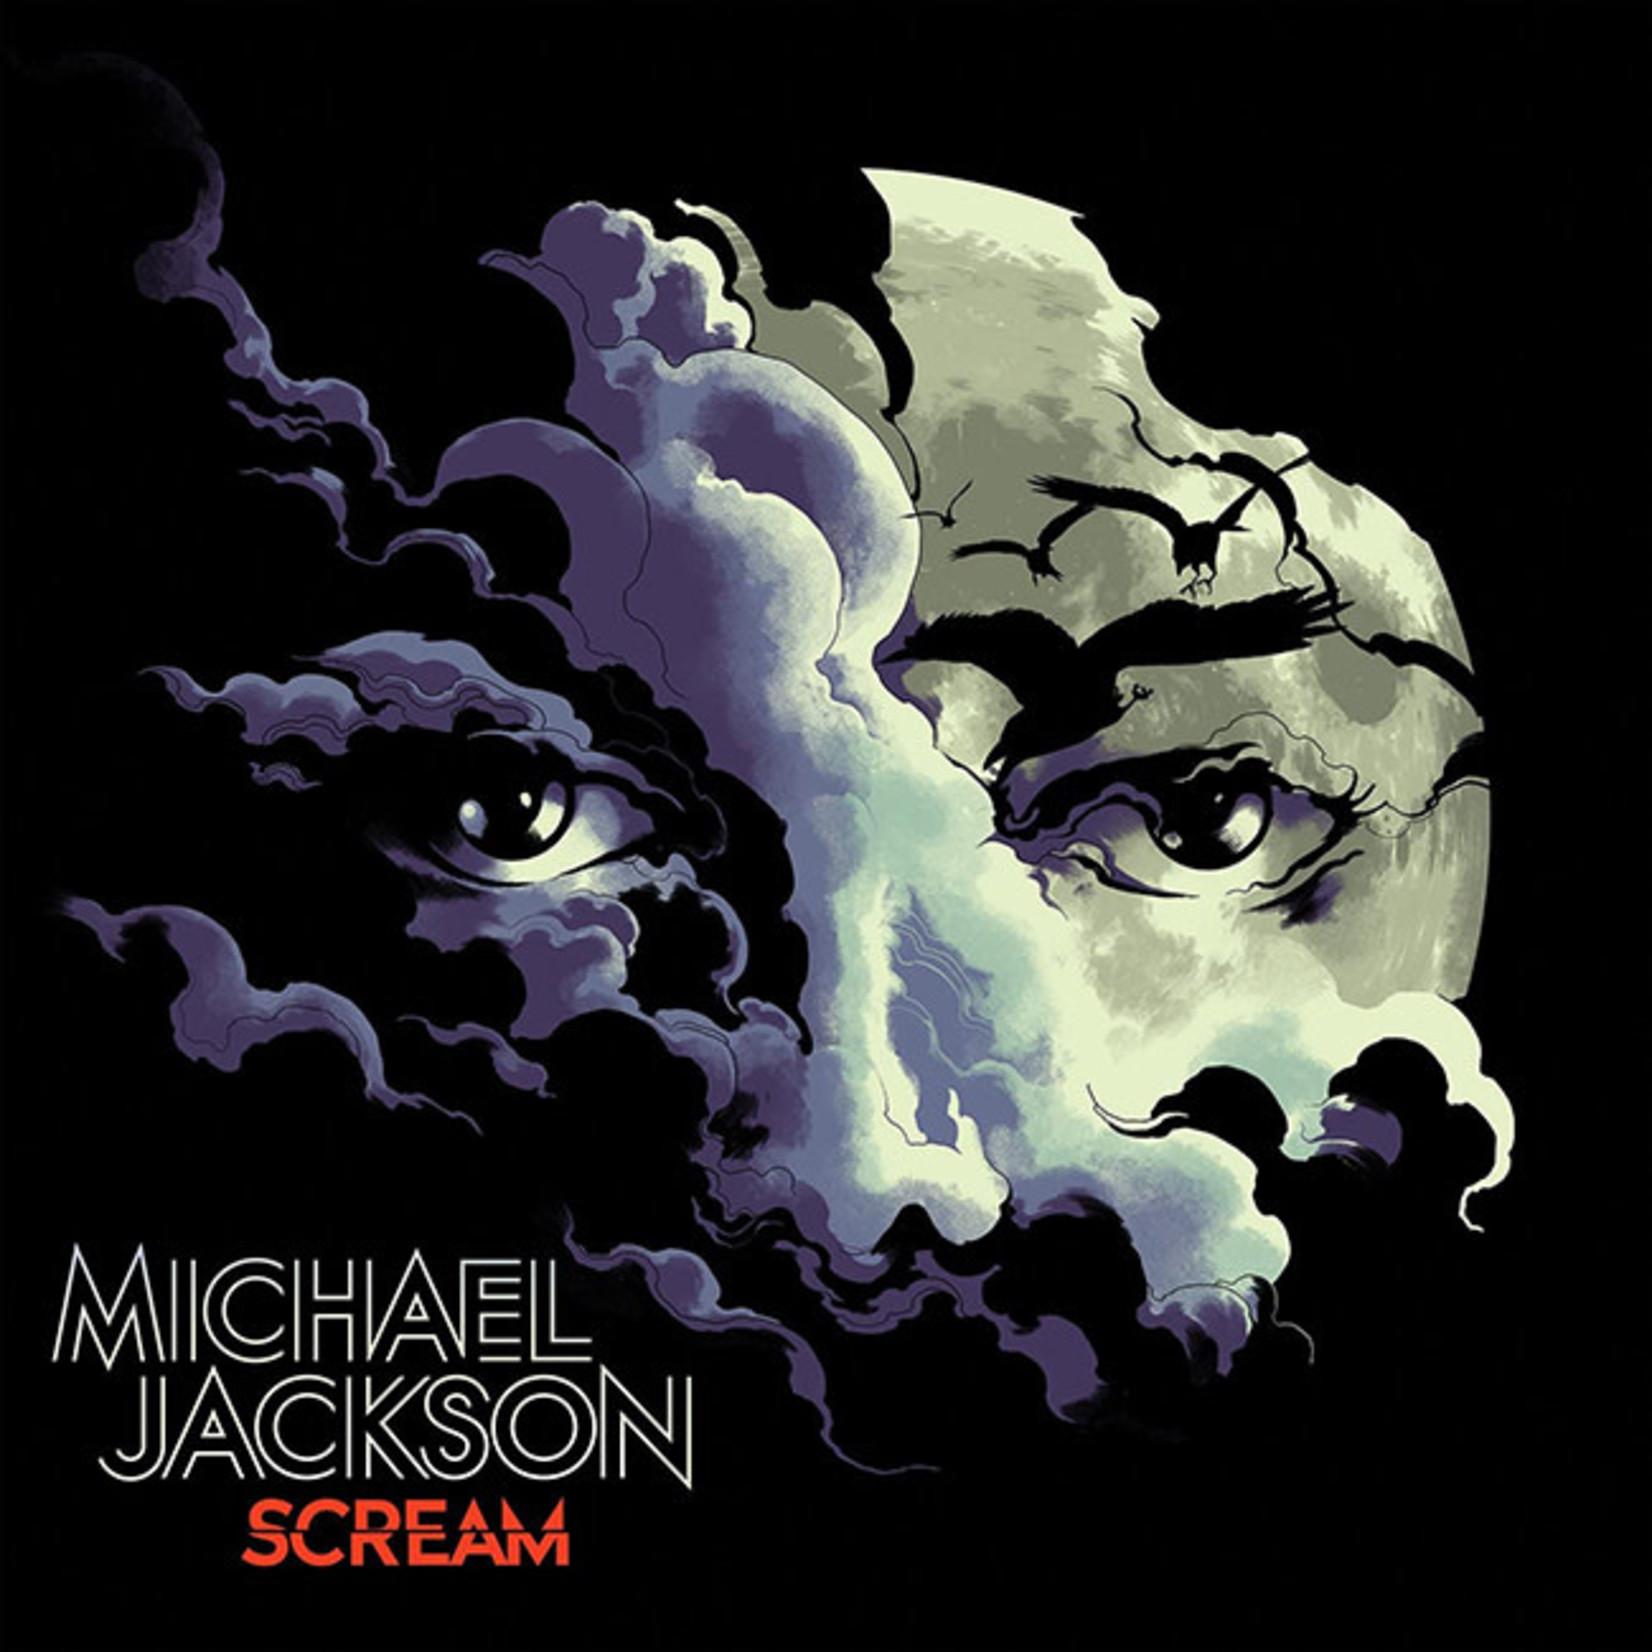 [New] Jackson, Michael: Scream (2LP, glow in the dark & translucent blue vinyl)